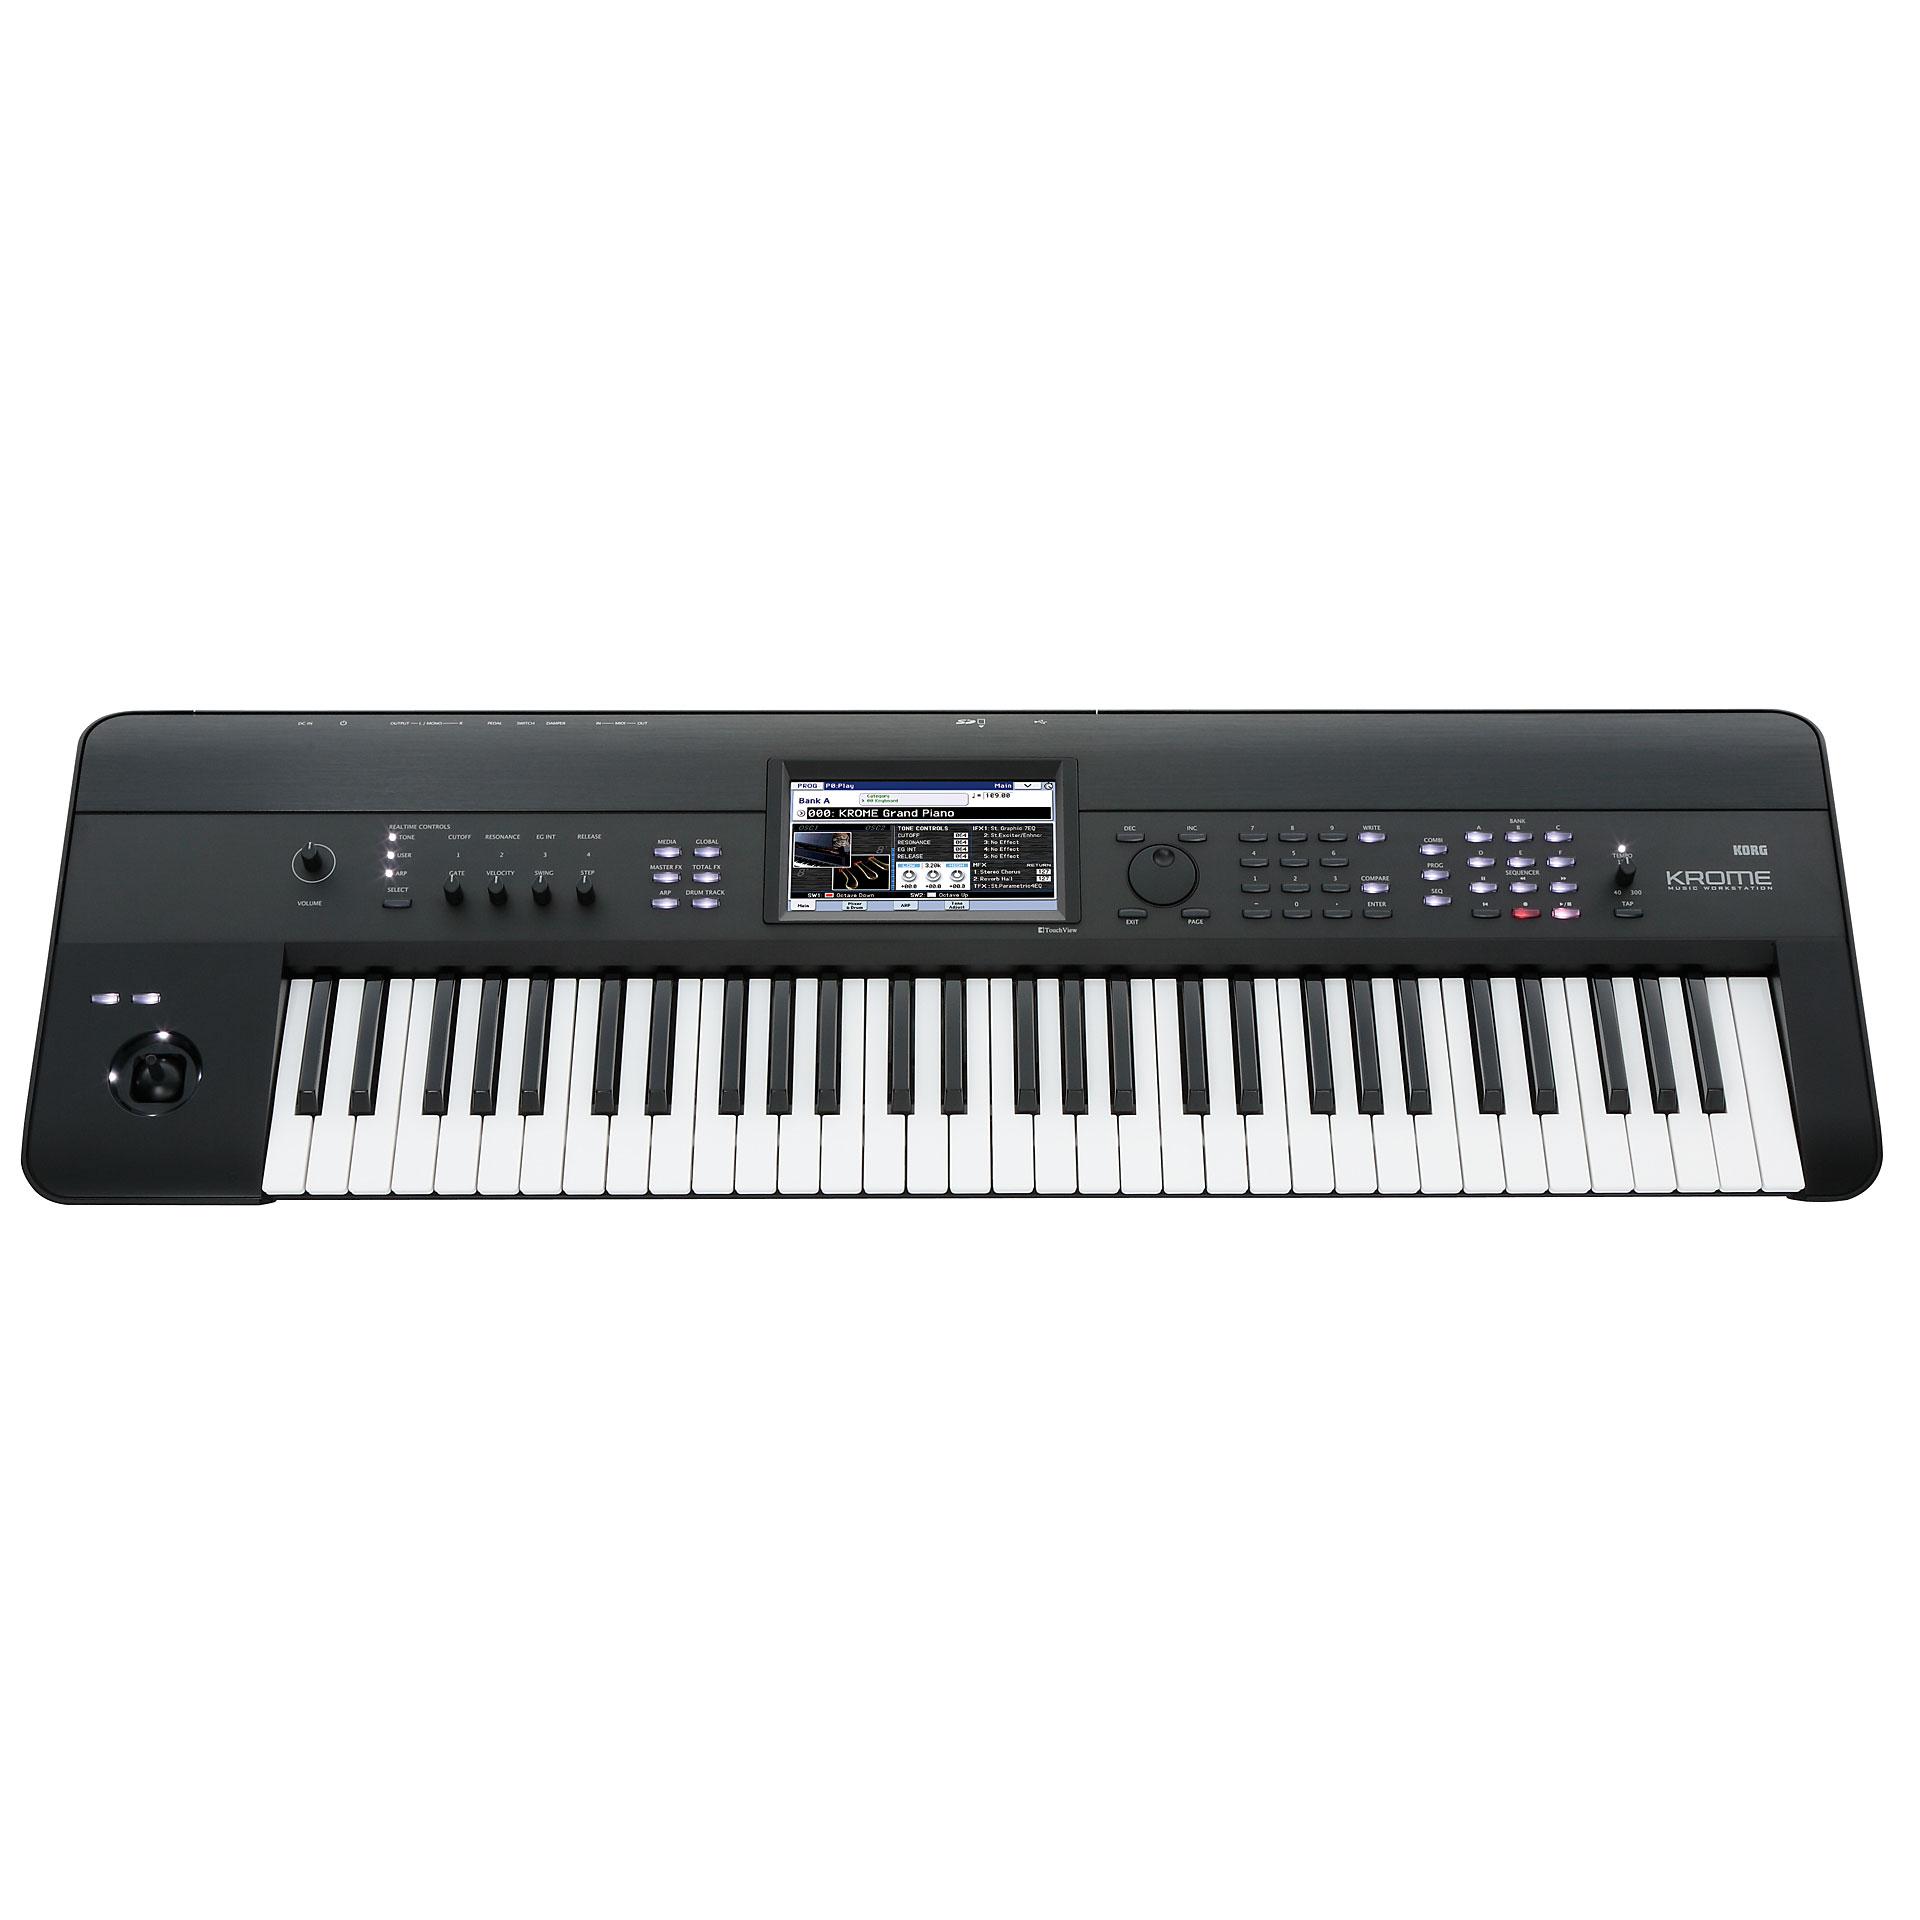 korg krome 61 synthesizer rh musik produktiv com korg krome manual pdf korg krome manual for dummies